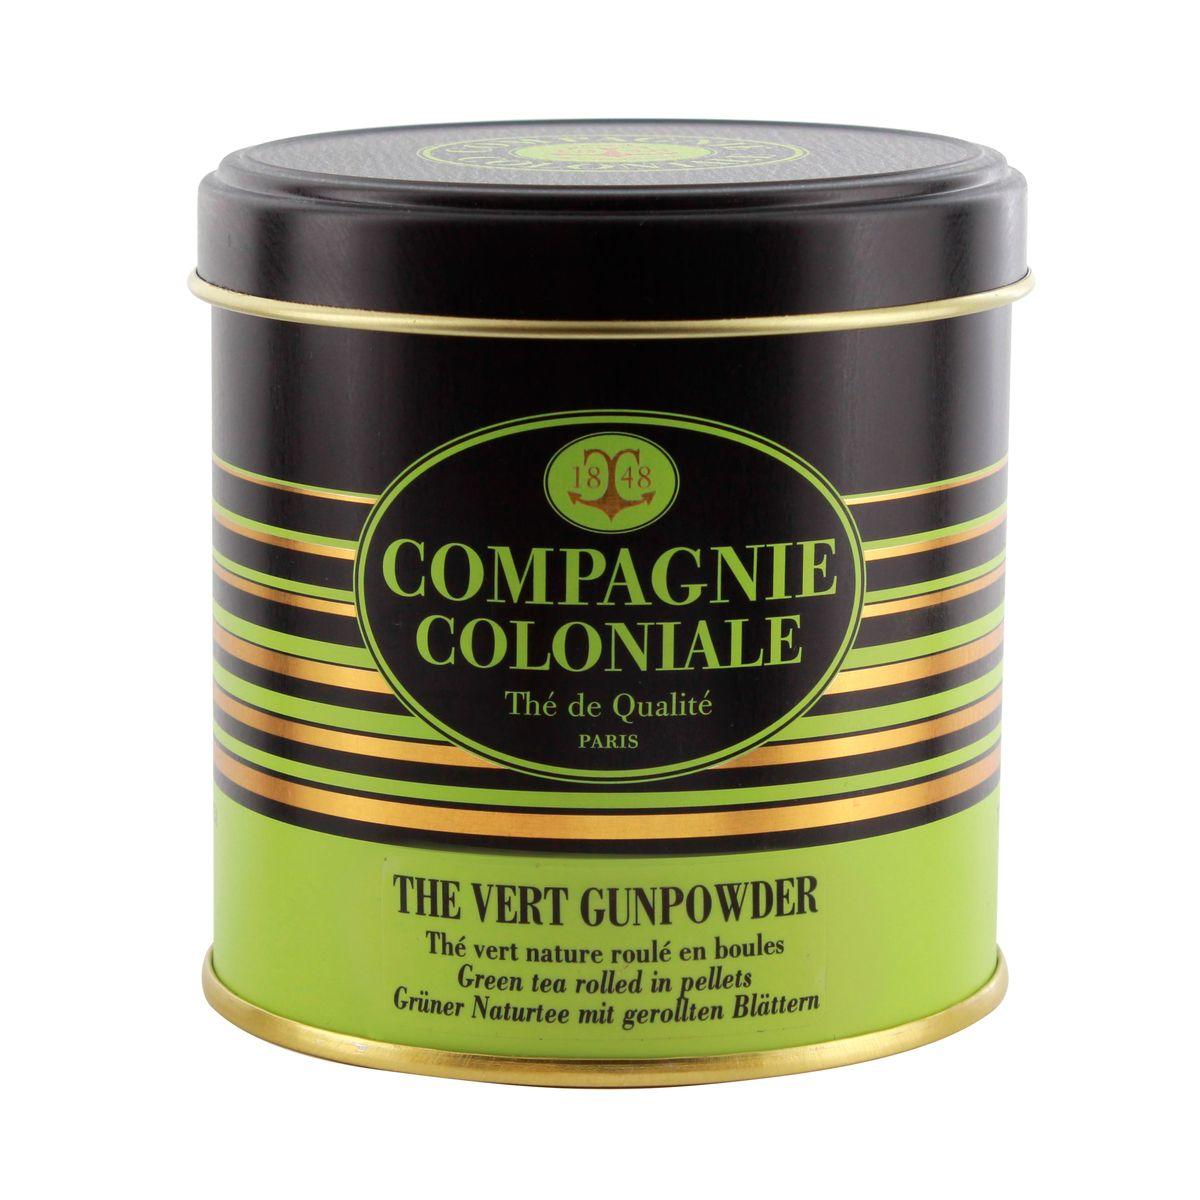 Thé vert aromatisé boîte métal thé vert Gunpowder - Compagnie Coloniale